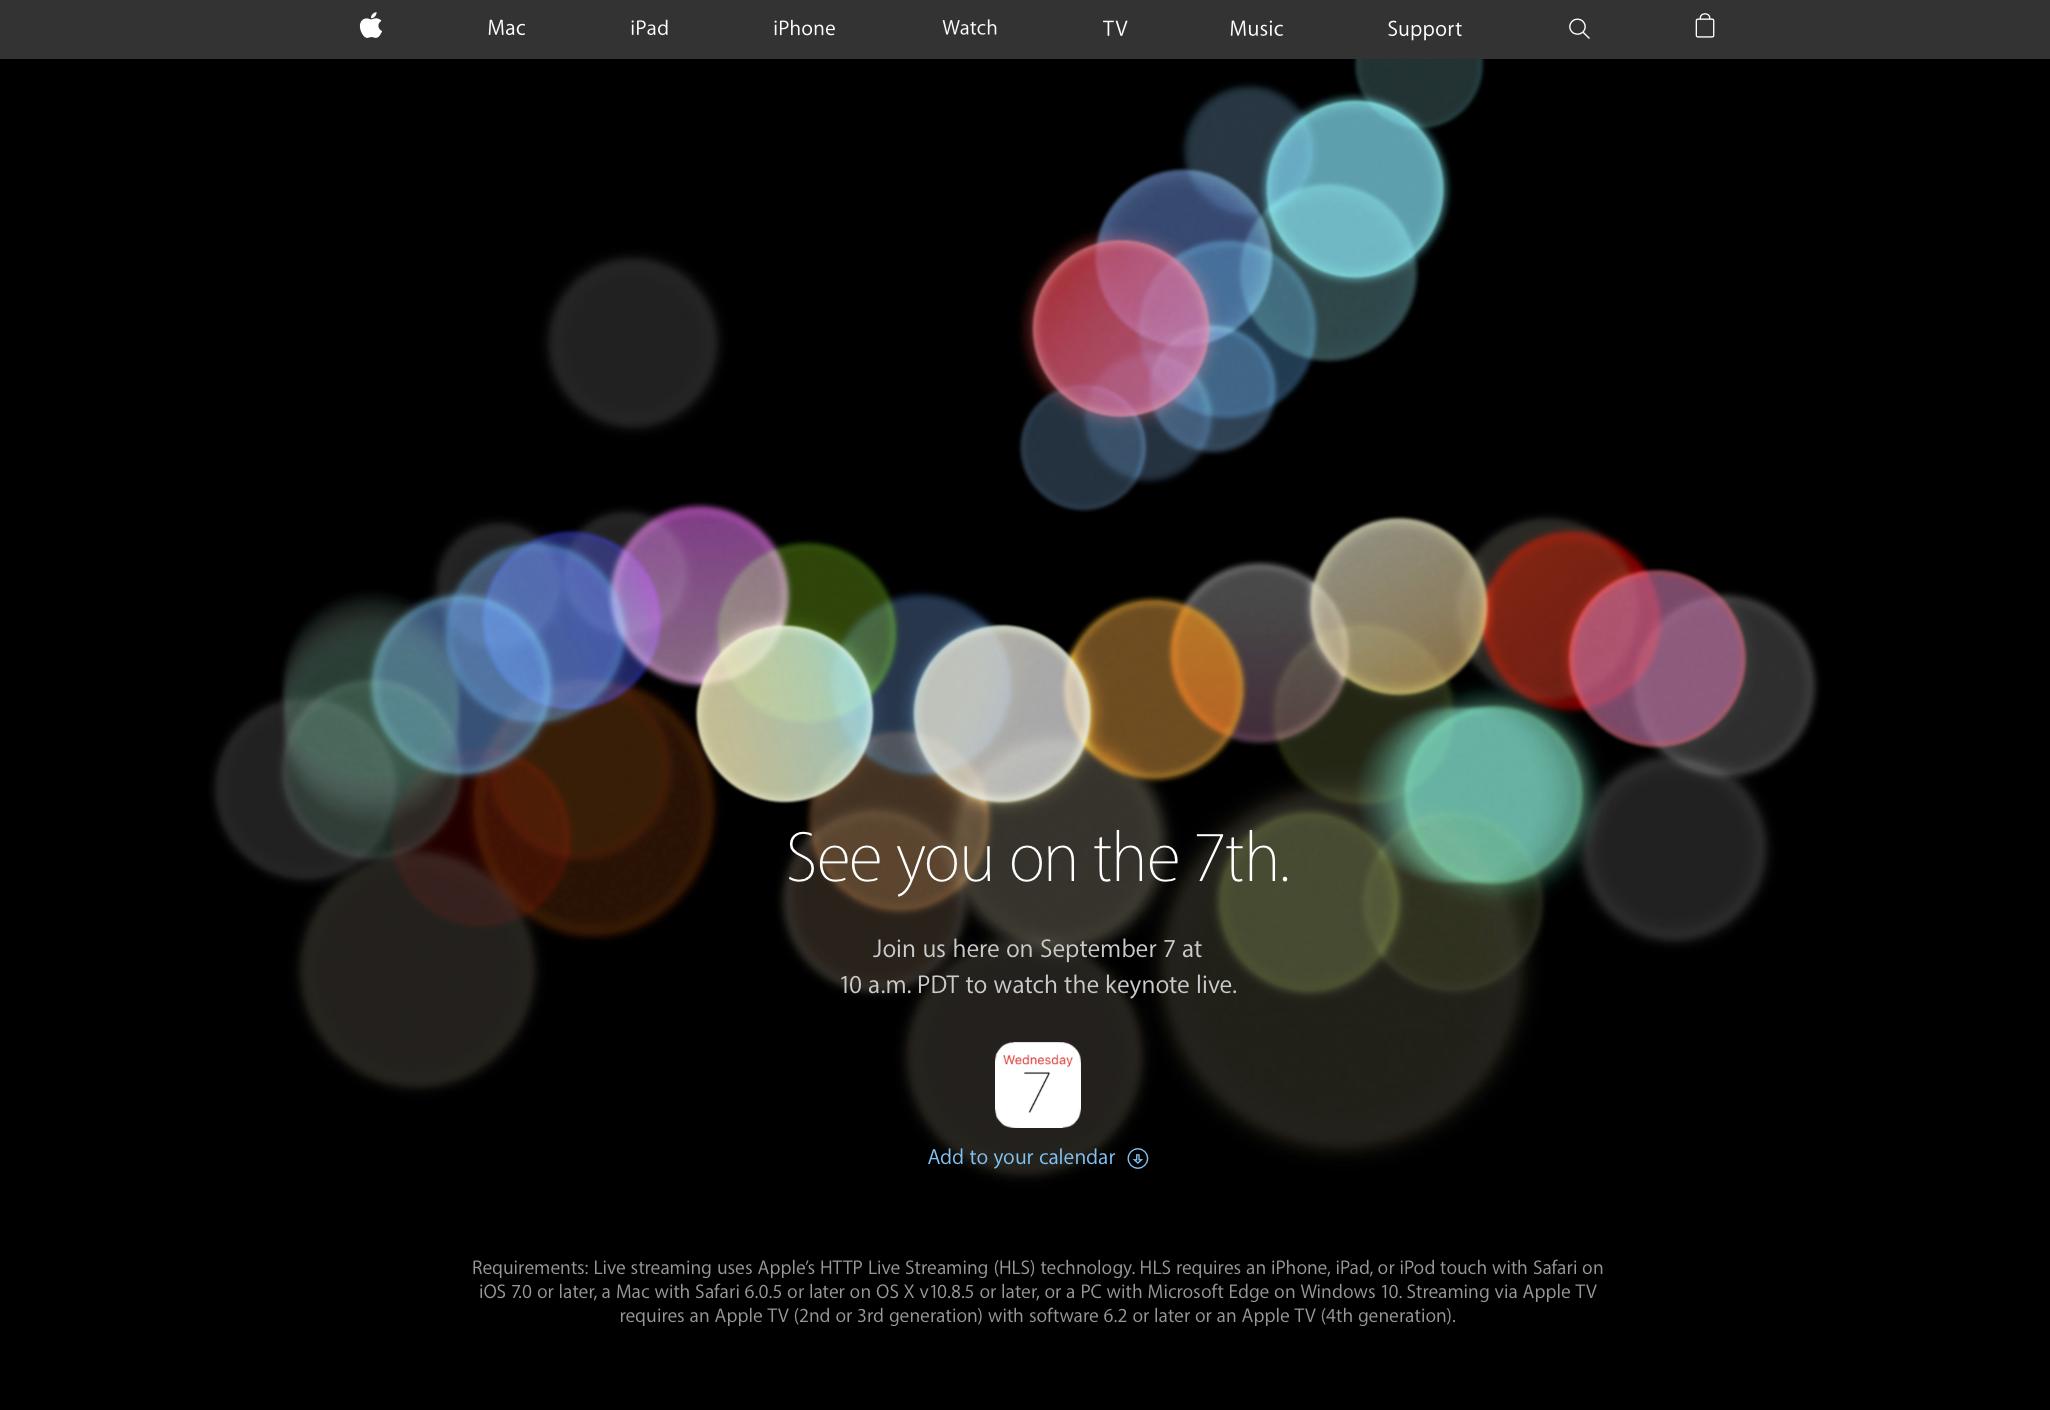 apple_events_september_2016